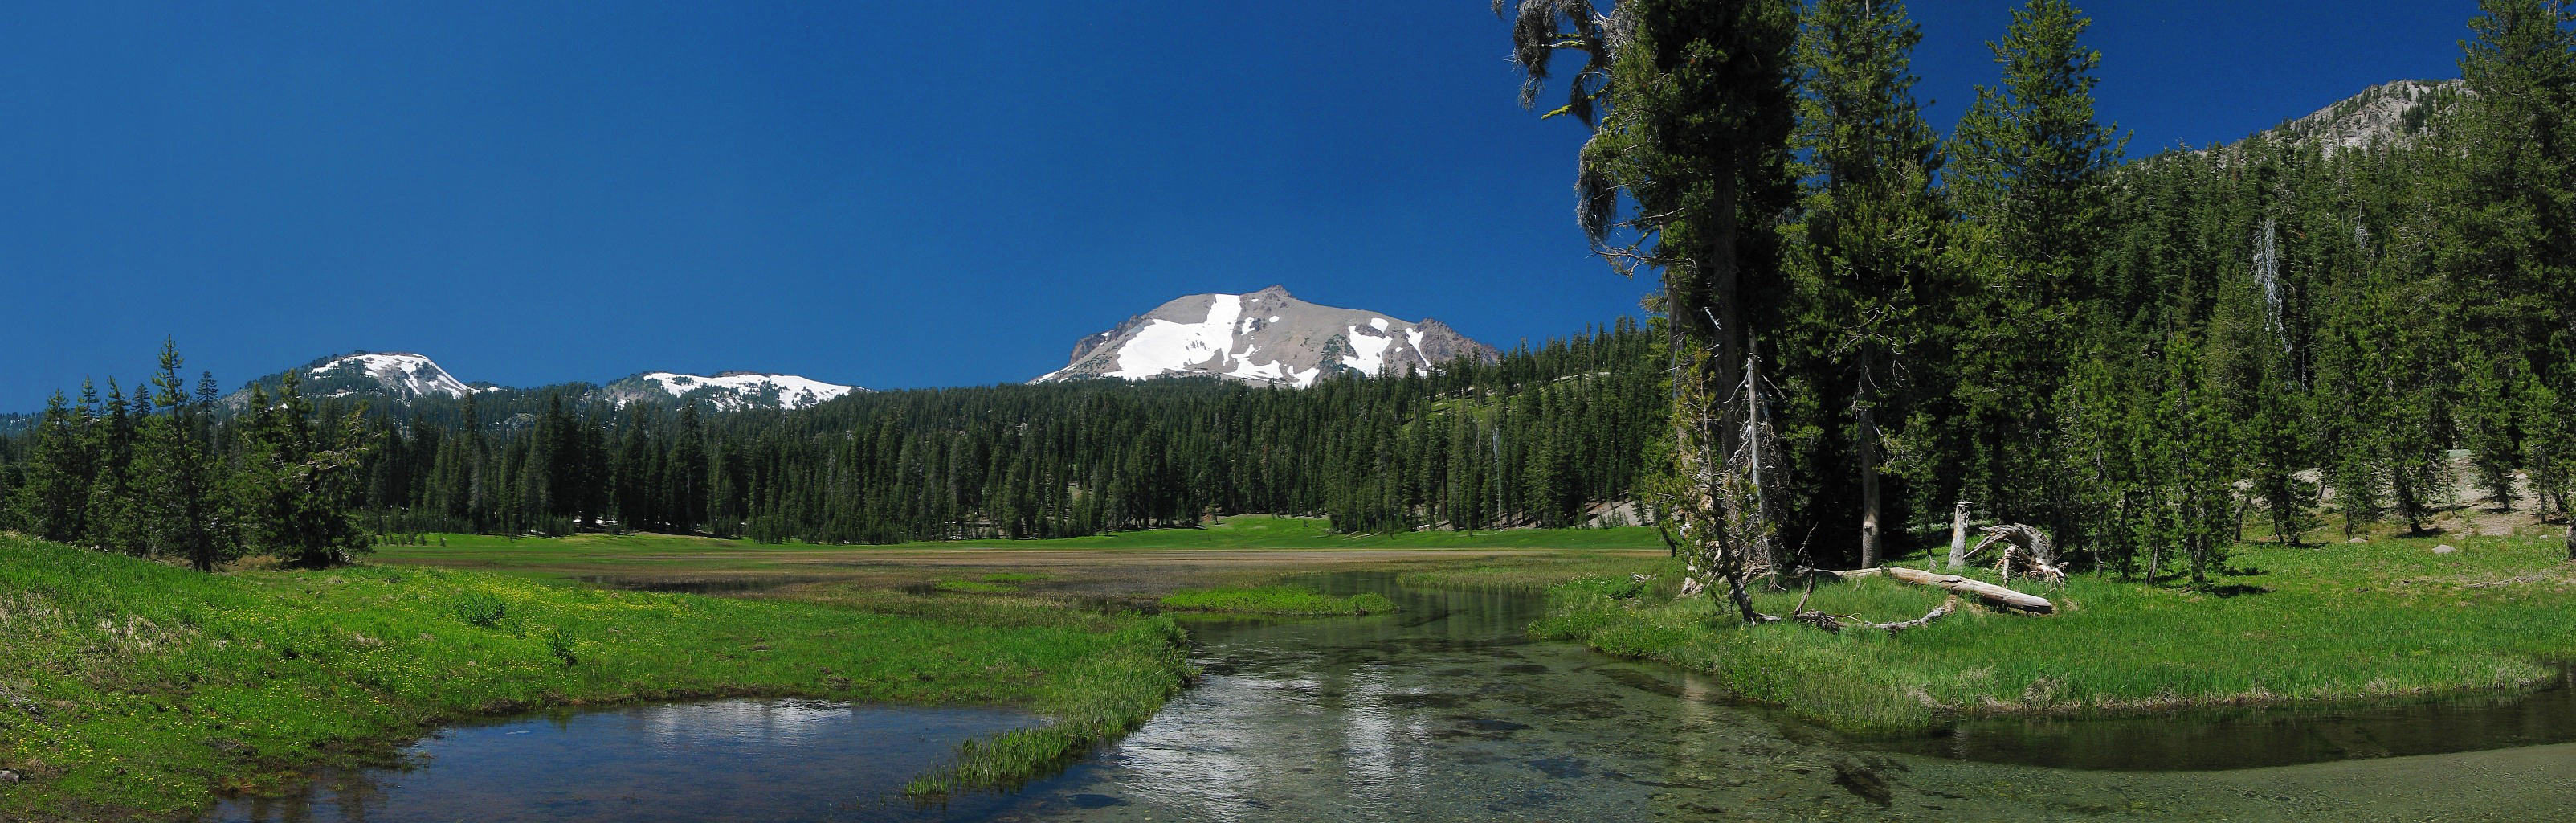 Kings Creek With Len Peak On The Horizon